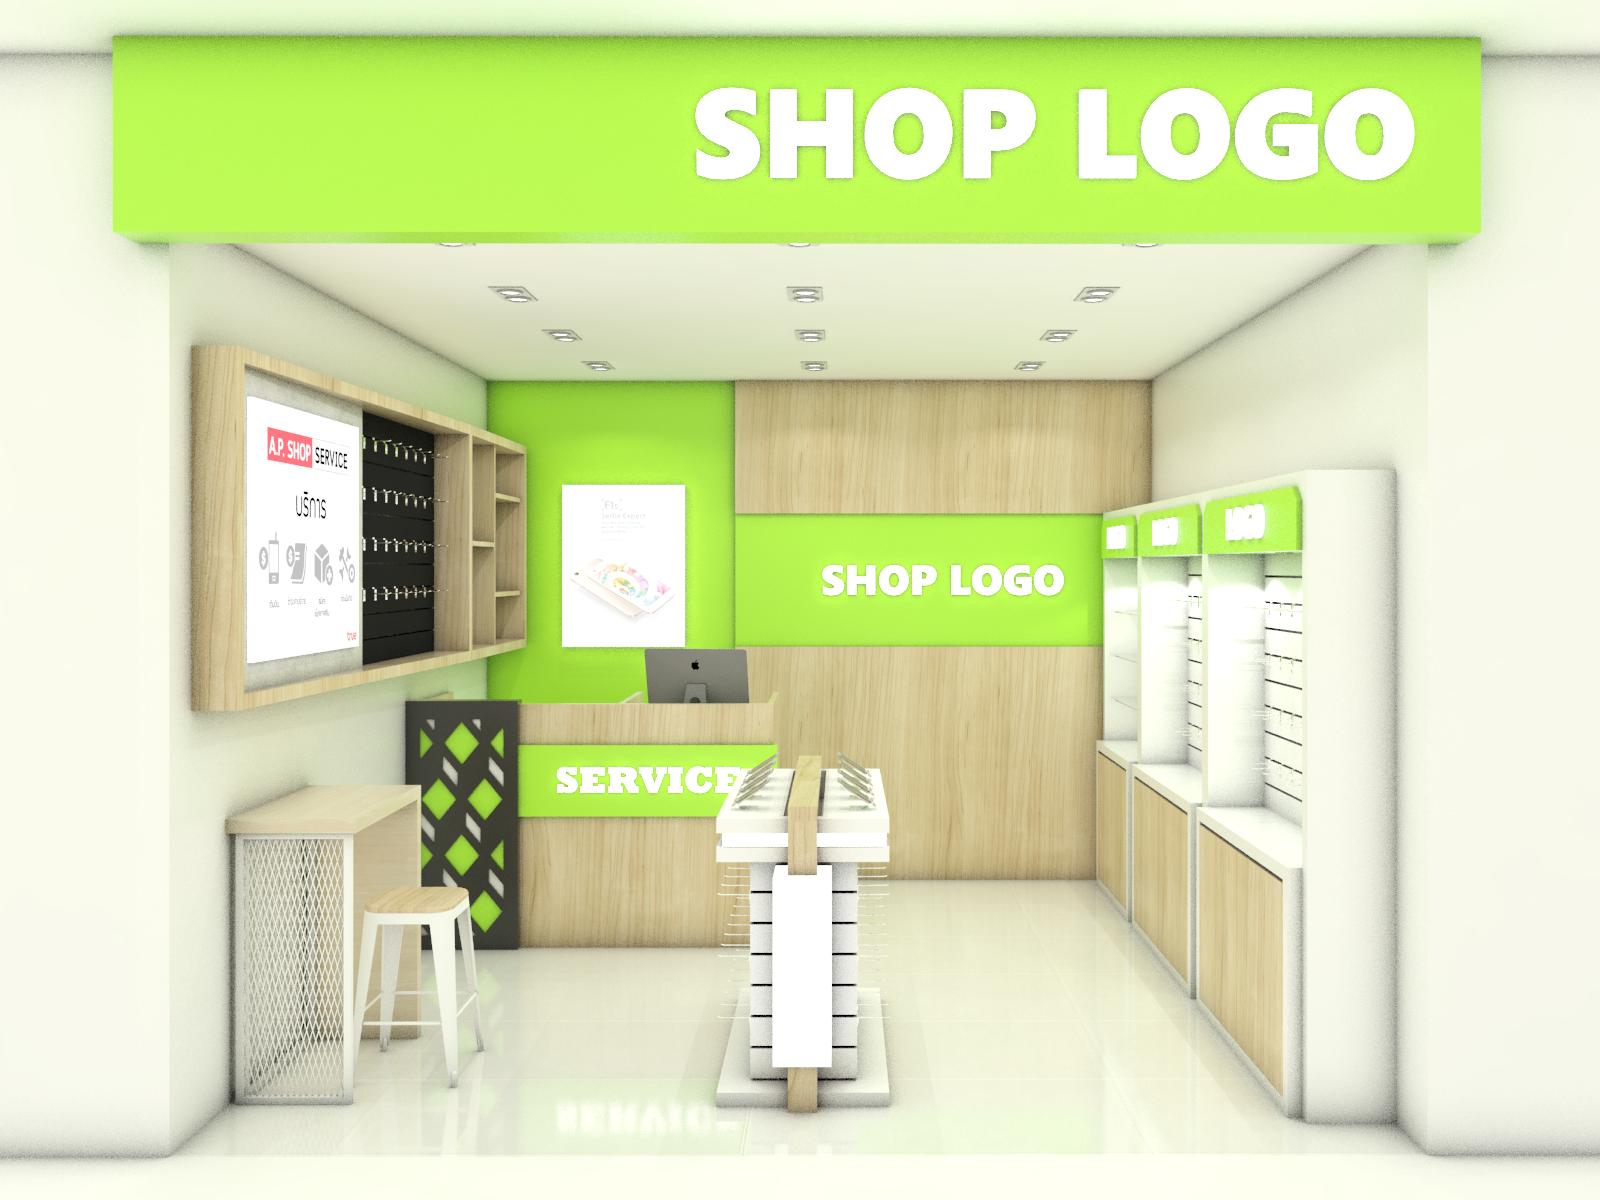 Shop set design 1(copy)(copy)(copy)(copy)(copy)(copy)(copy)(copy)(copy)(copy)(copy)(copy)(copy)(copy)(copy)(copy)(copy)(copy)(copy)(copy)